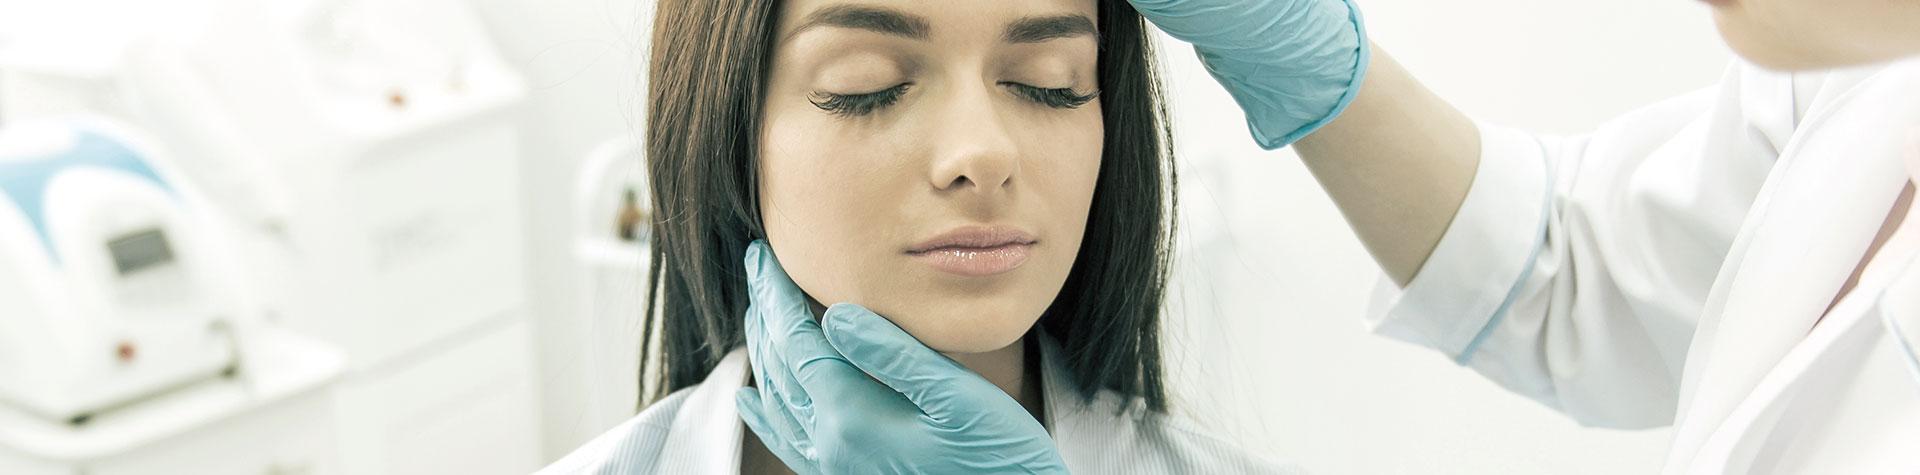 operace-oblicej.jpg